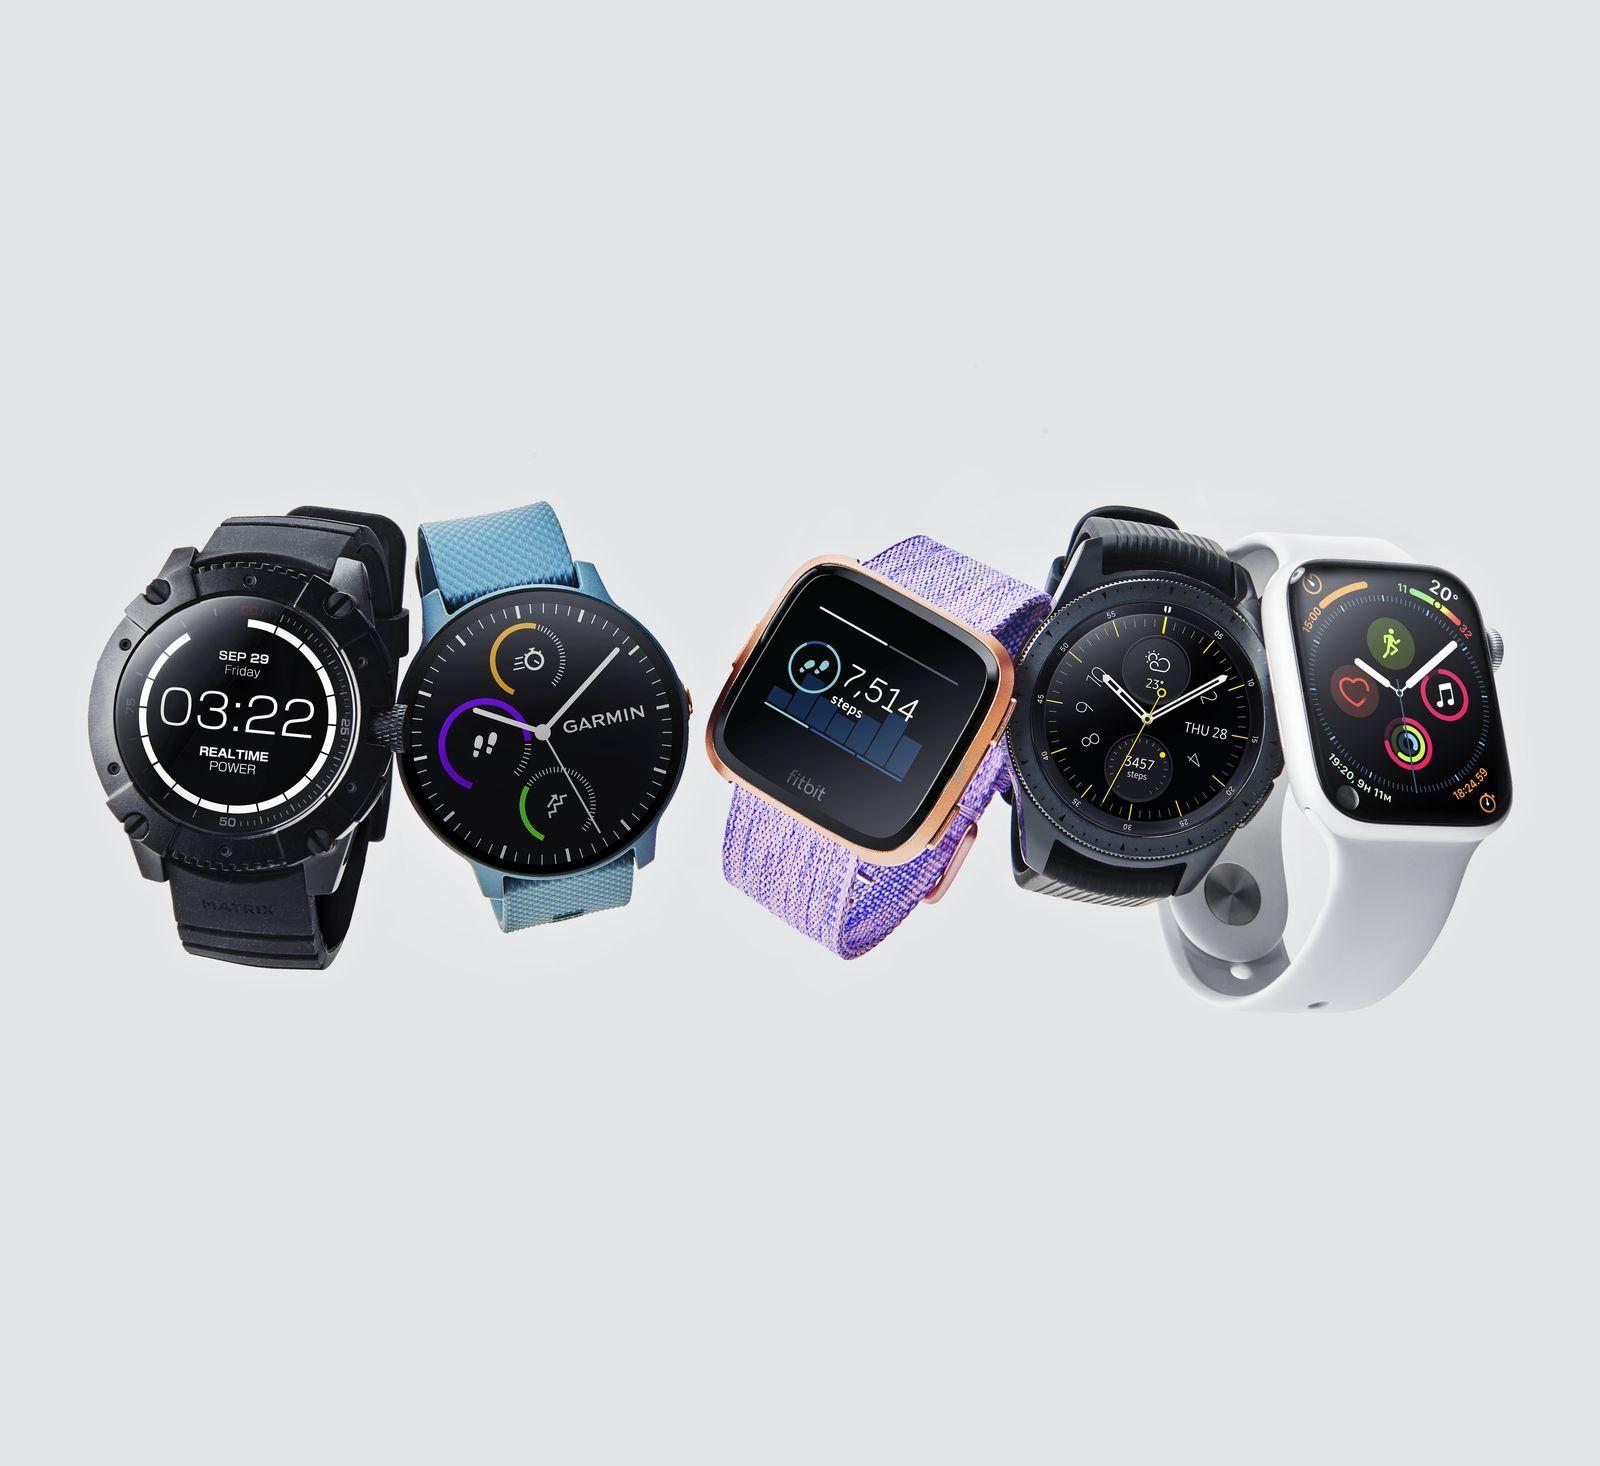 Apple Watch Series 4 Smart watch, Swiss army watches